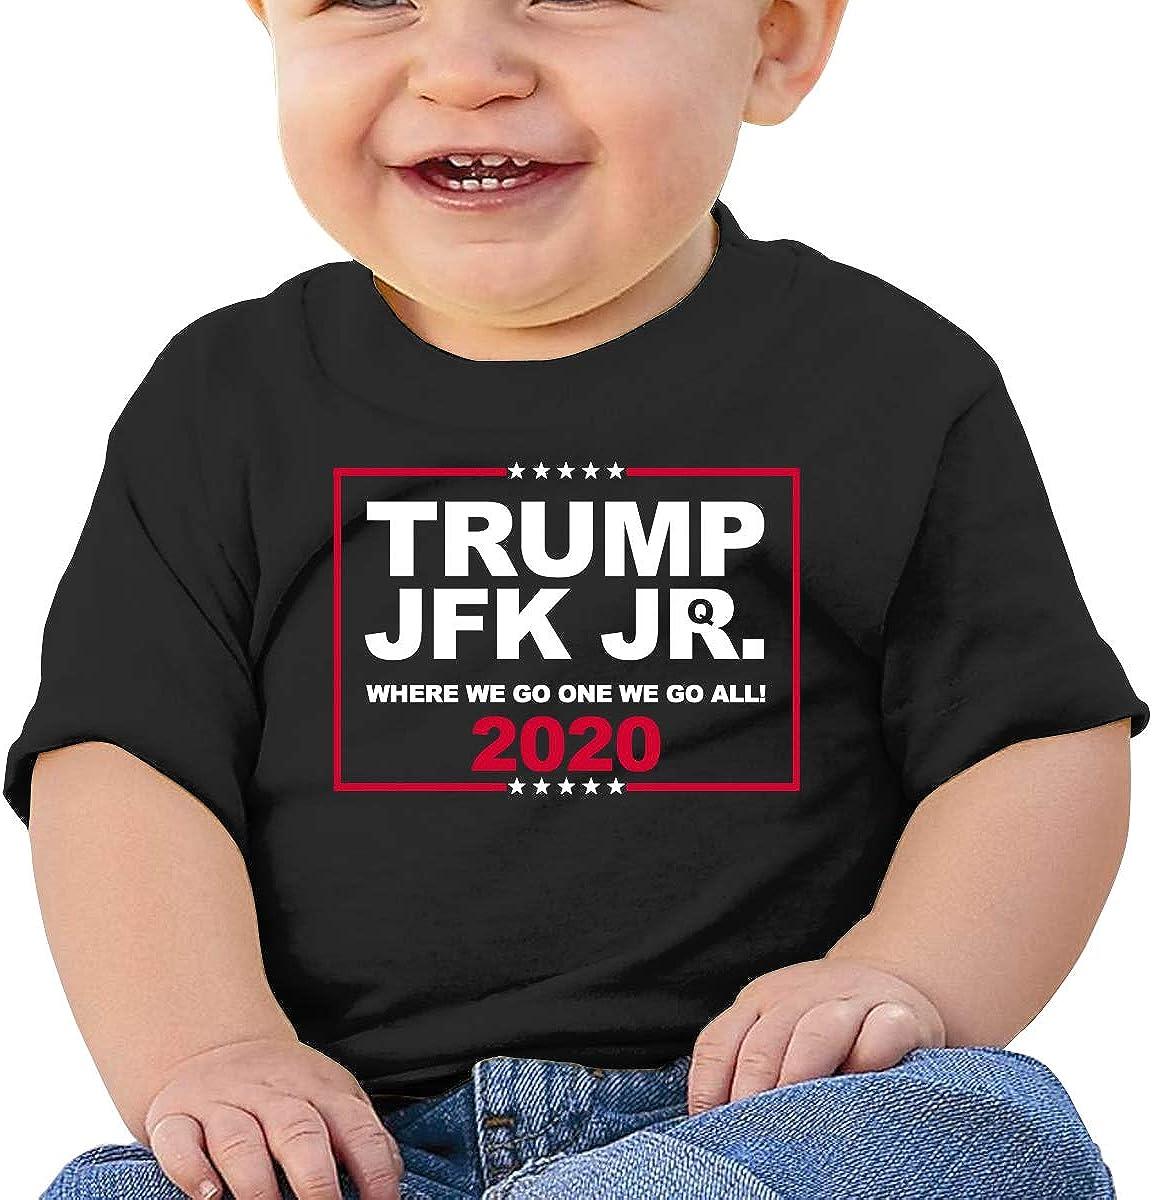 Trump JFK Jr All Cotton Unisex Baby Shirt Short Sleeve Shirts